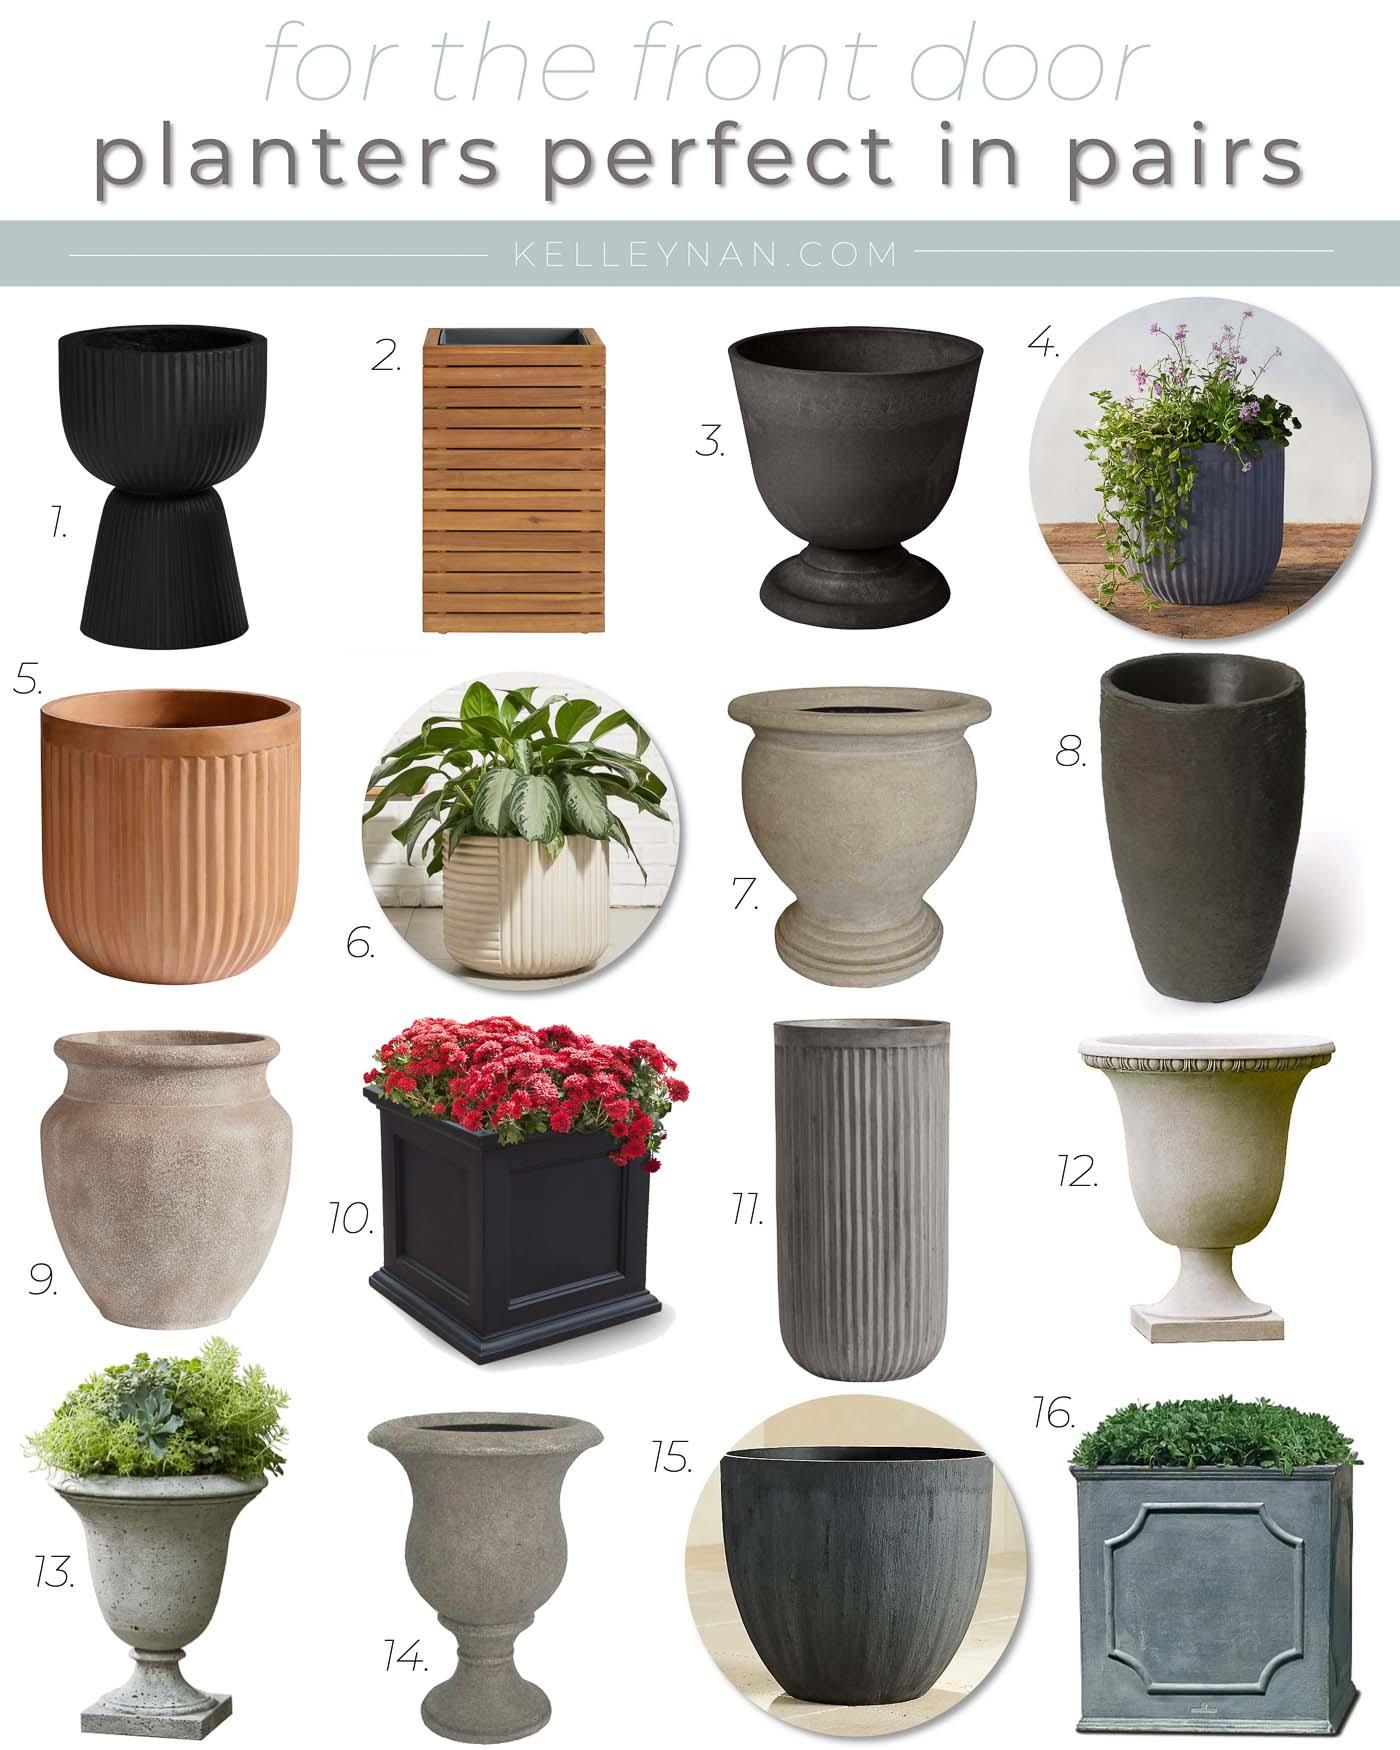 16 Pretty Front Porch Planters & Urns